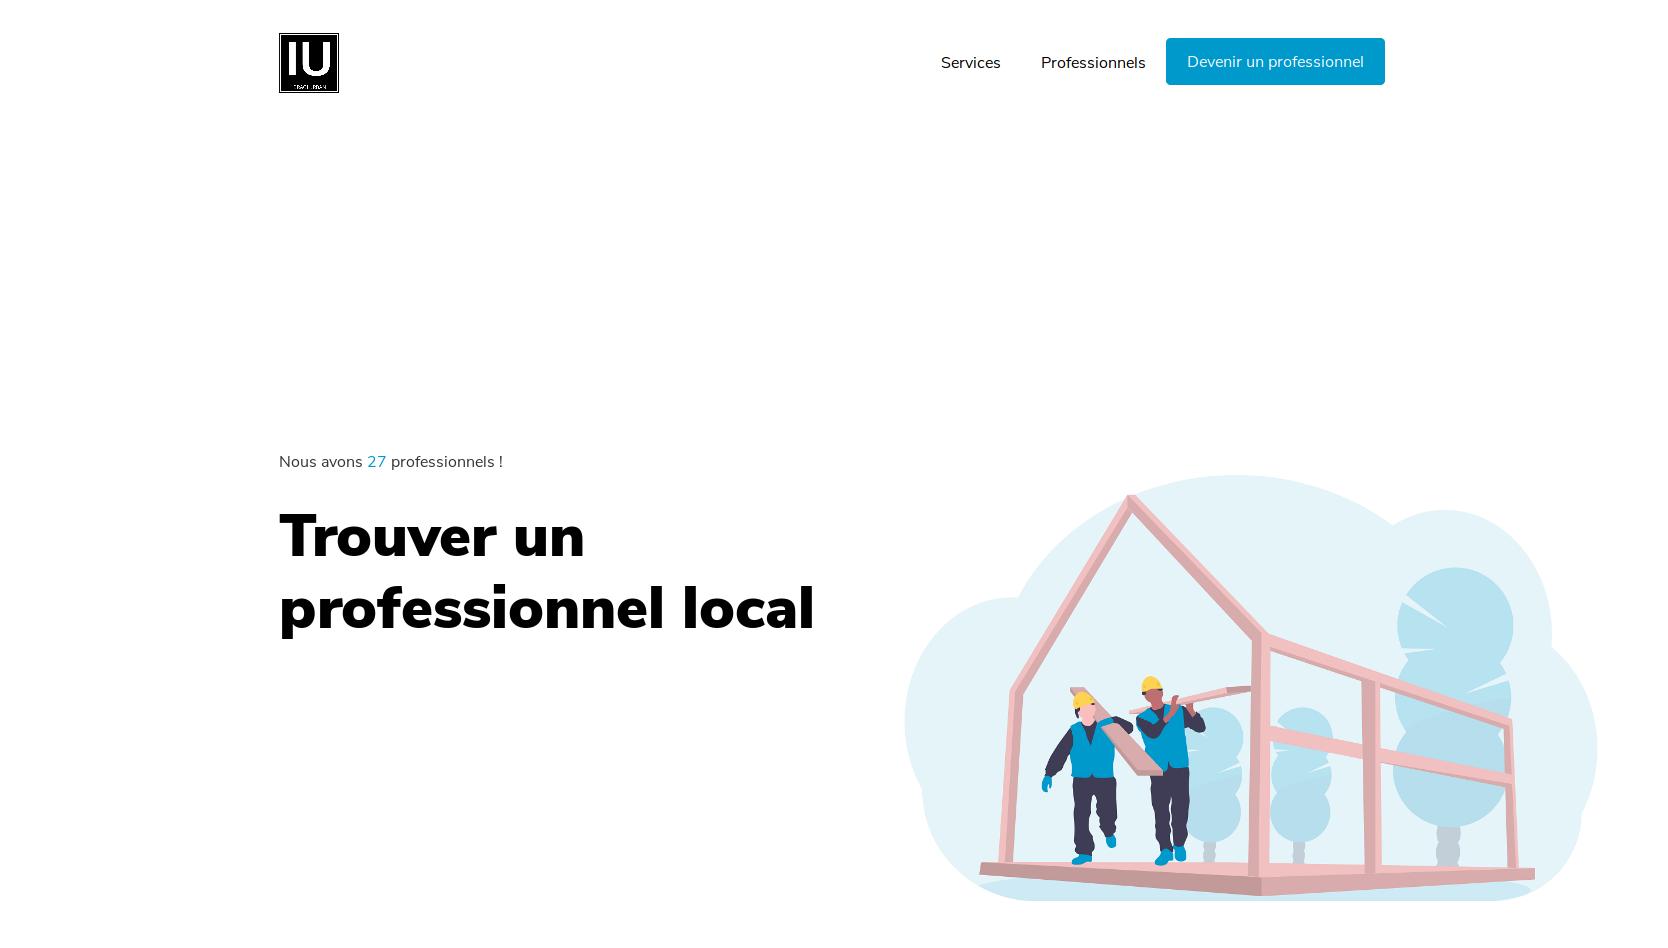 Ibraci Urban's website